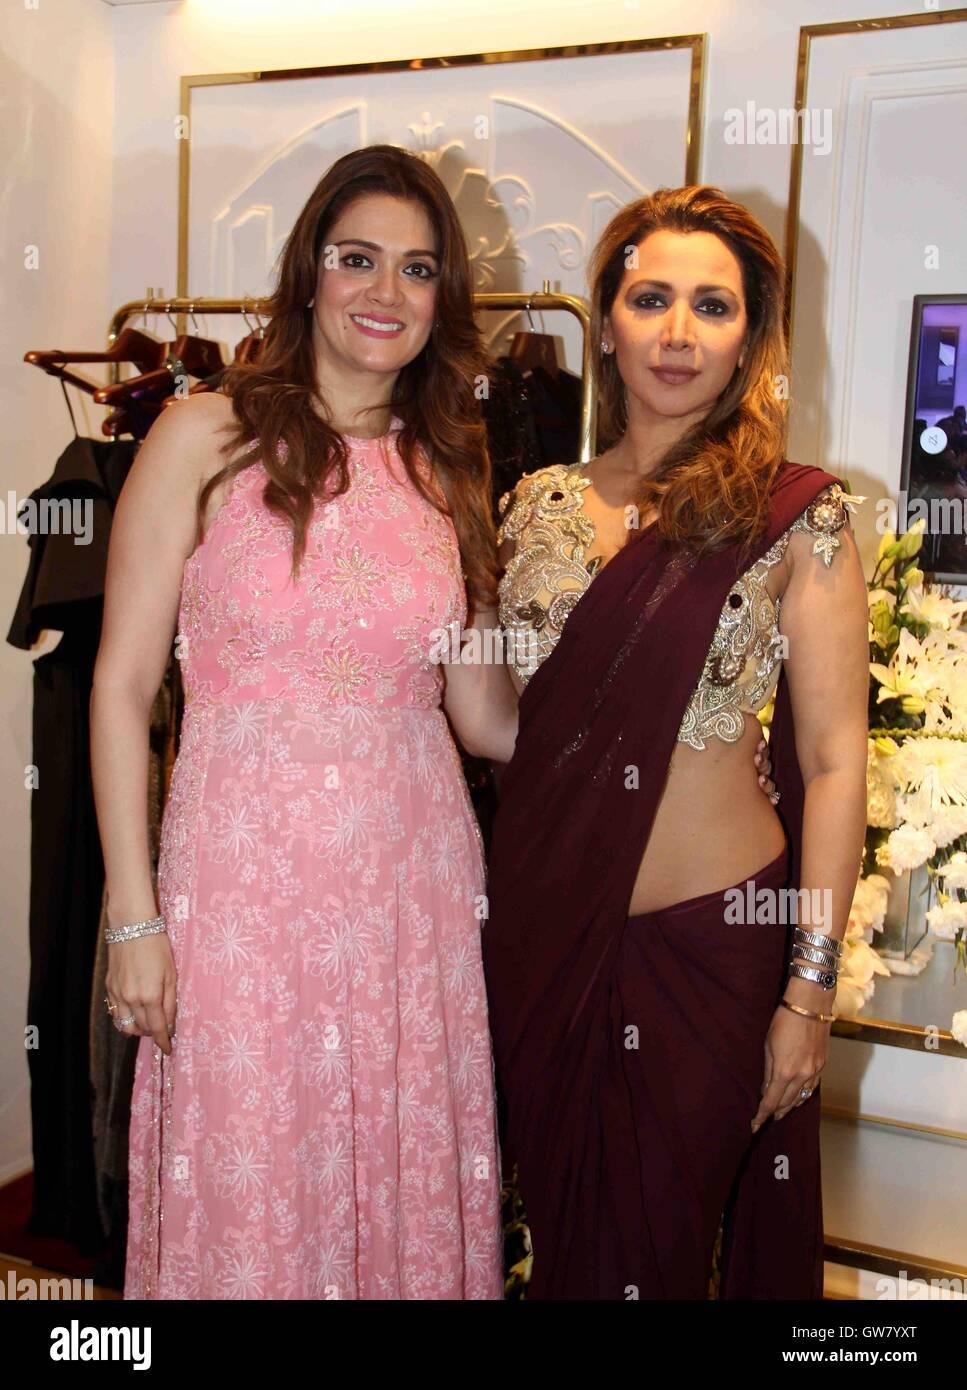 Fashion Designer Rebecca Dewan With Bollywood Actor Ritu Shivpuri Stock Photo Alamy